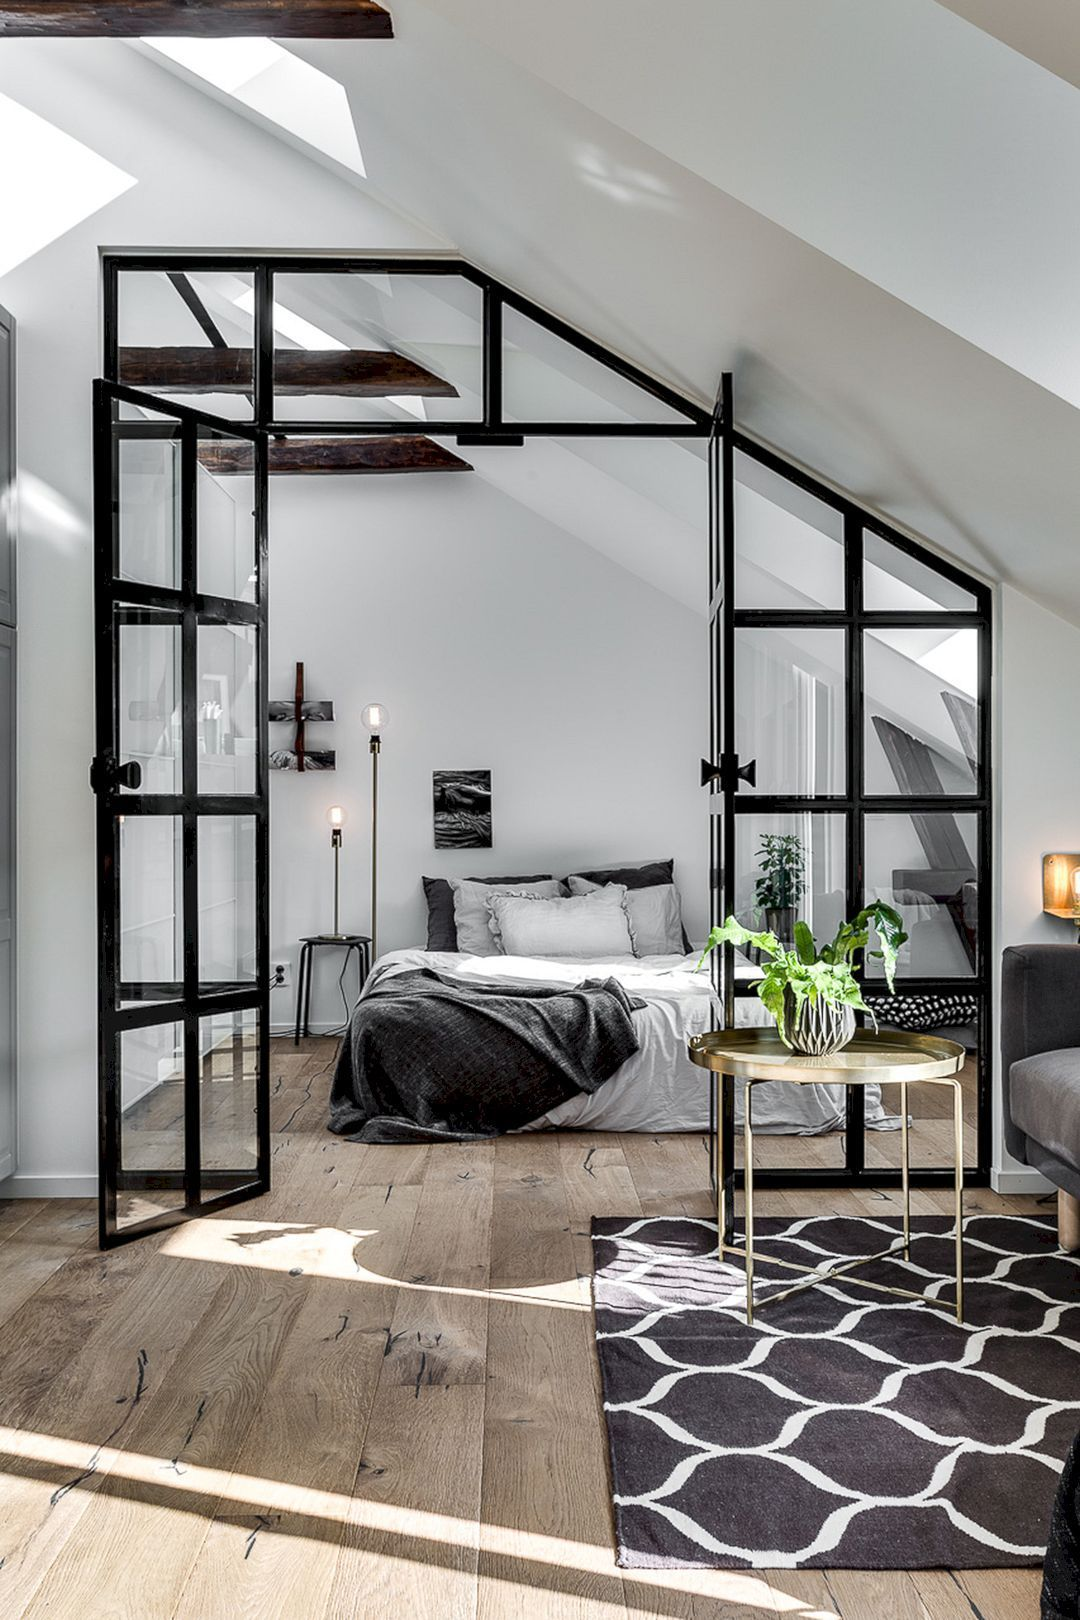 St Joseph Loft Transformation Of A Bedroom Loft Into A Quiet And